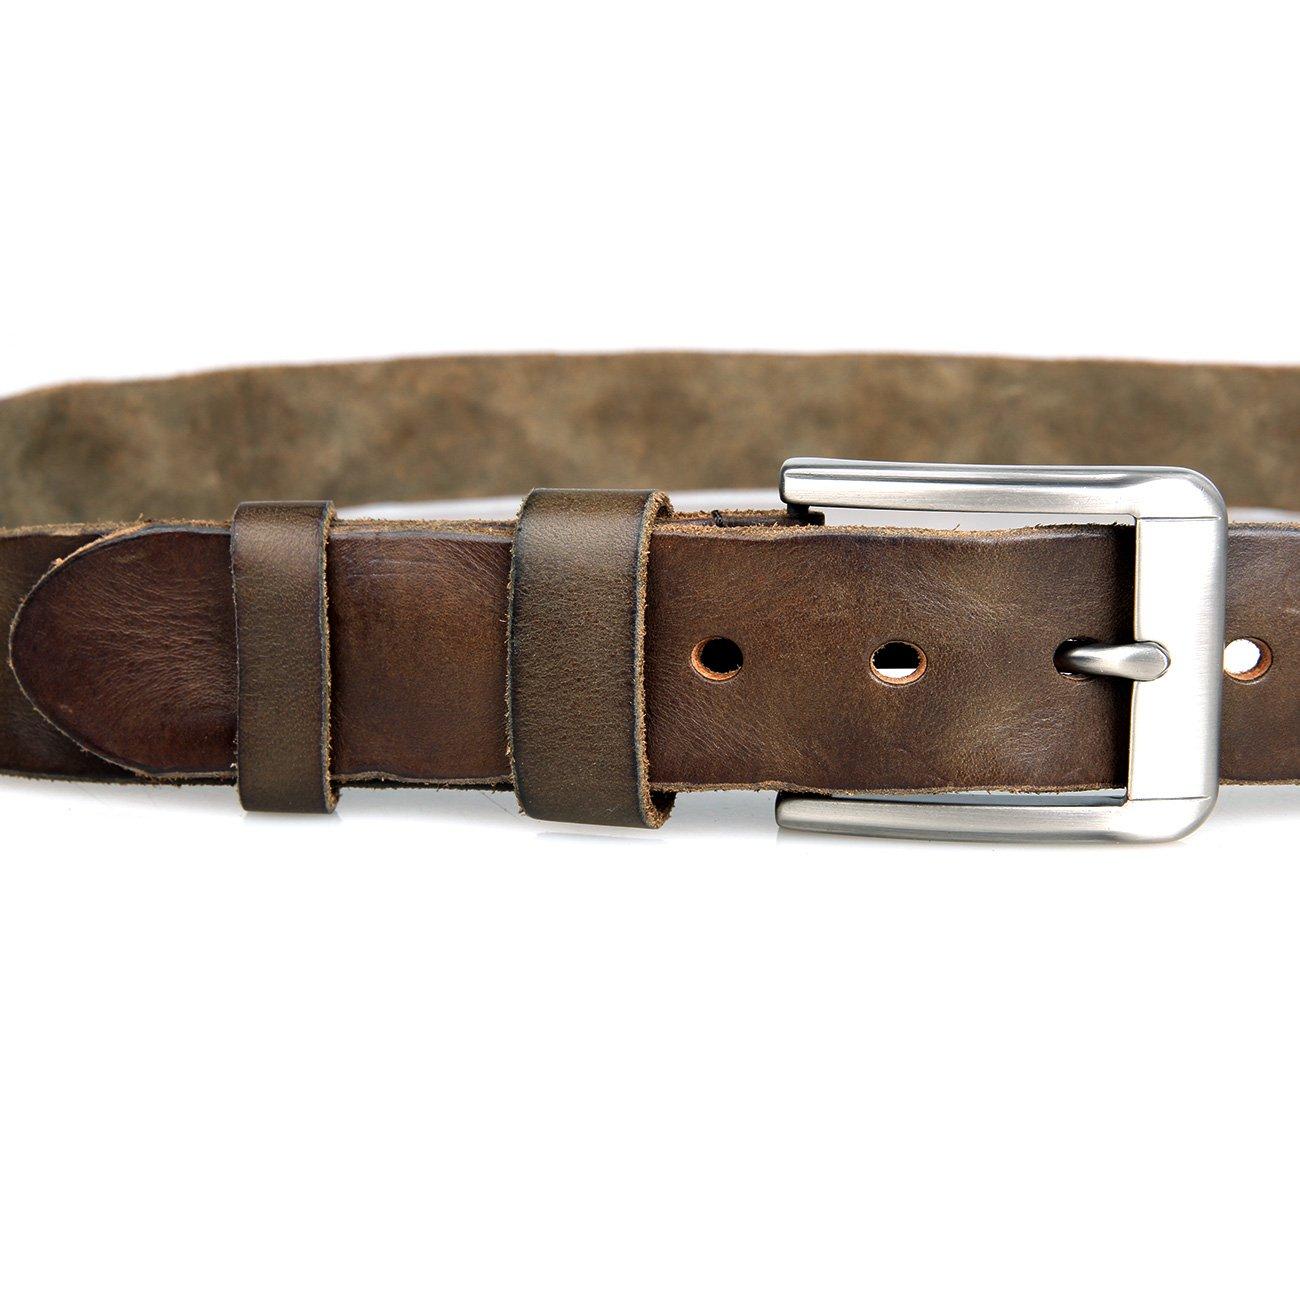 Genda 2Archer Mens Casual Jean Belt 35mm Leather Dress Belts